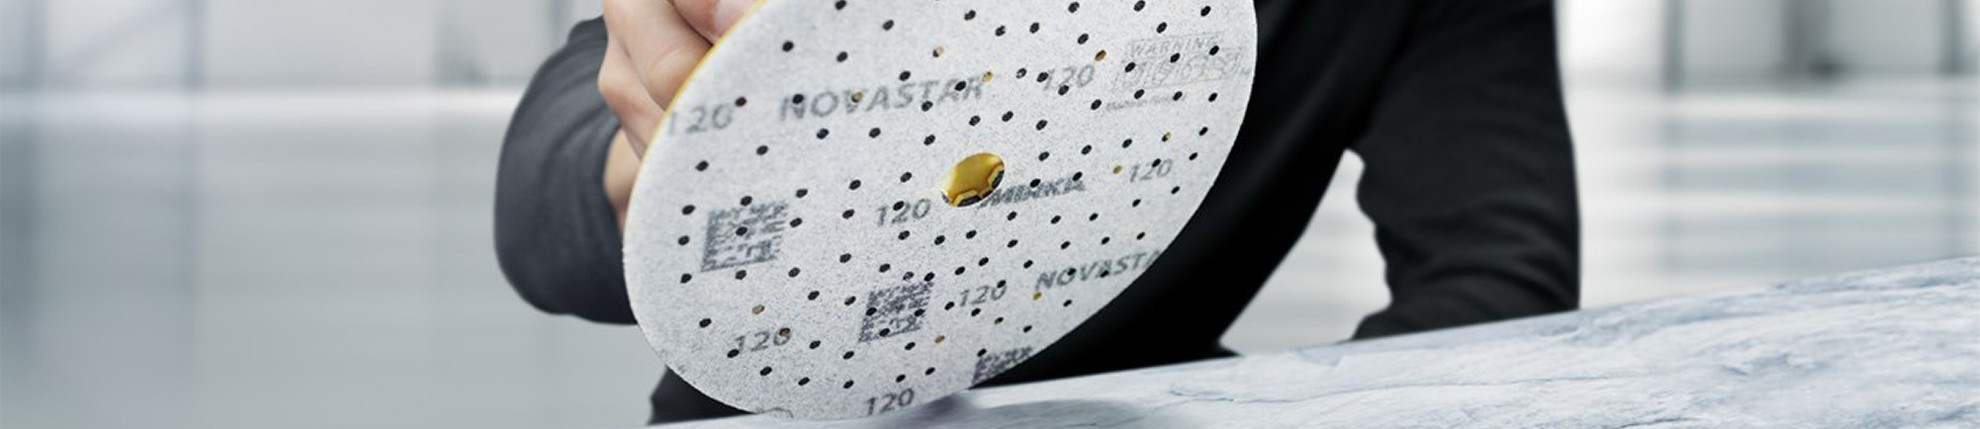 Mirka Novastar™ - abrasif haute qualité sur support film